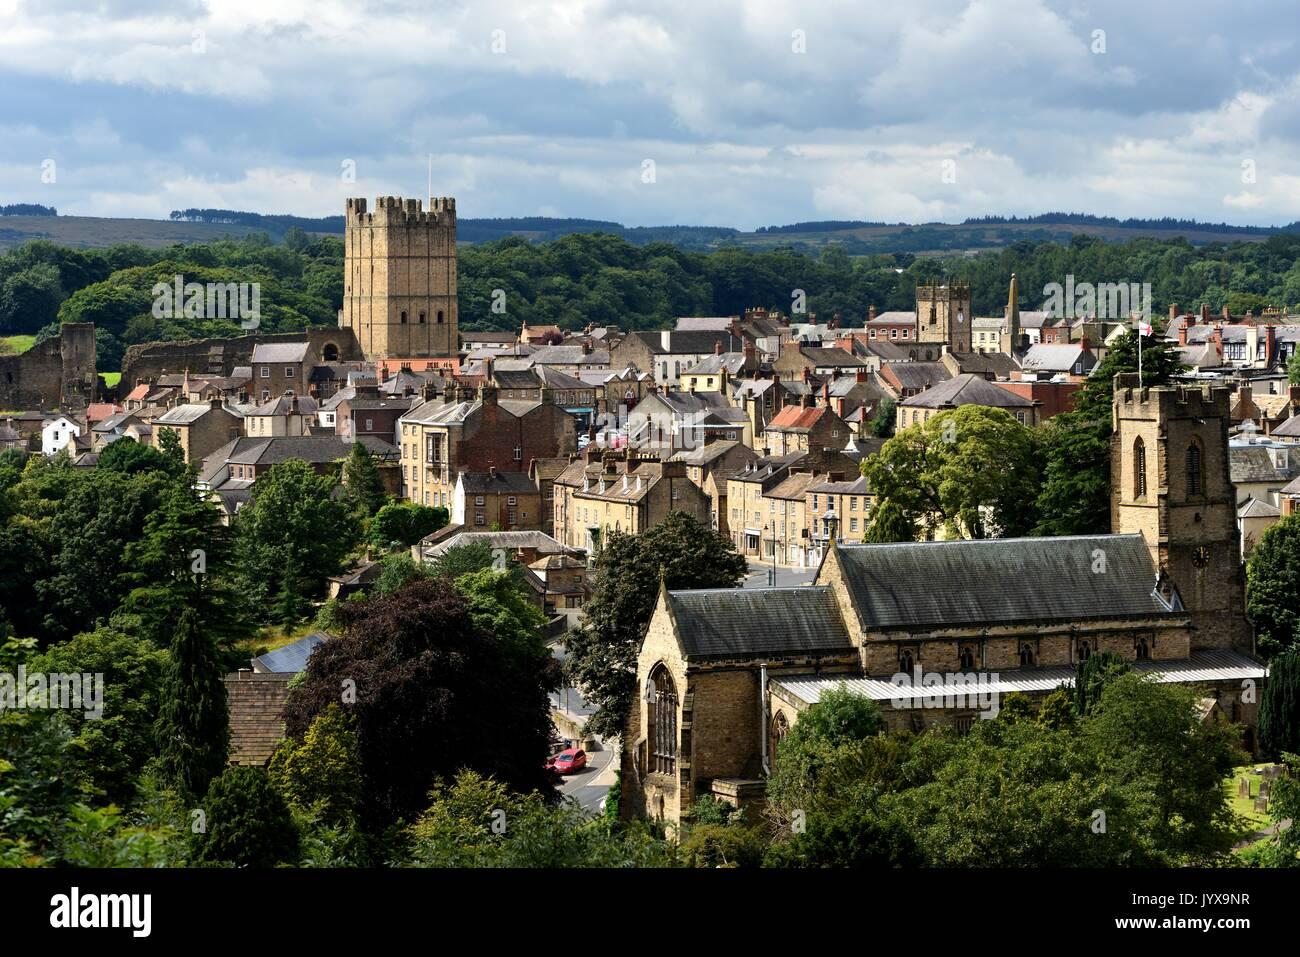 Richmond North Yorkshire - Stock Image